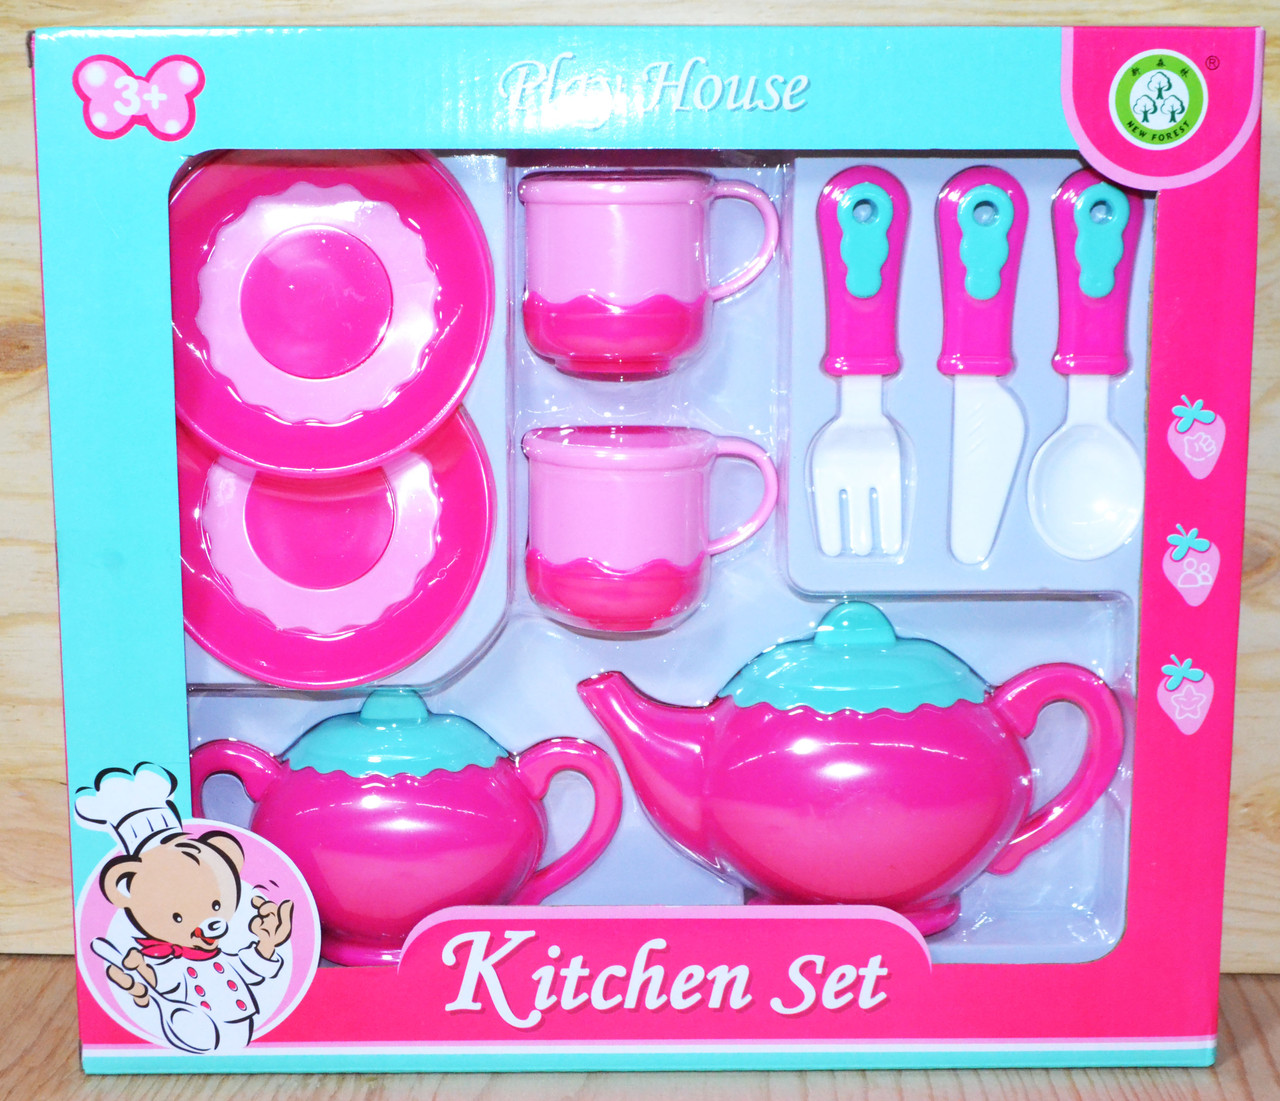 NF787-17 Чайный сервиз Kitchen Set 31*27см